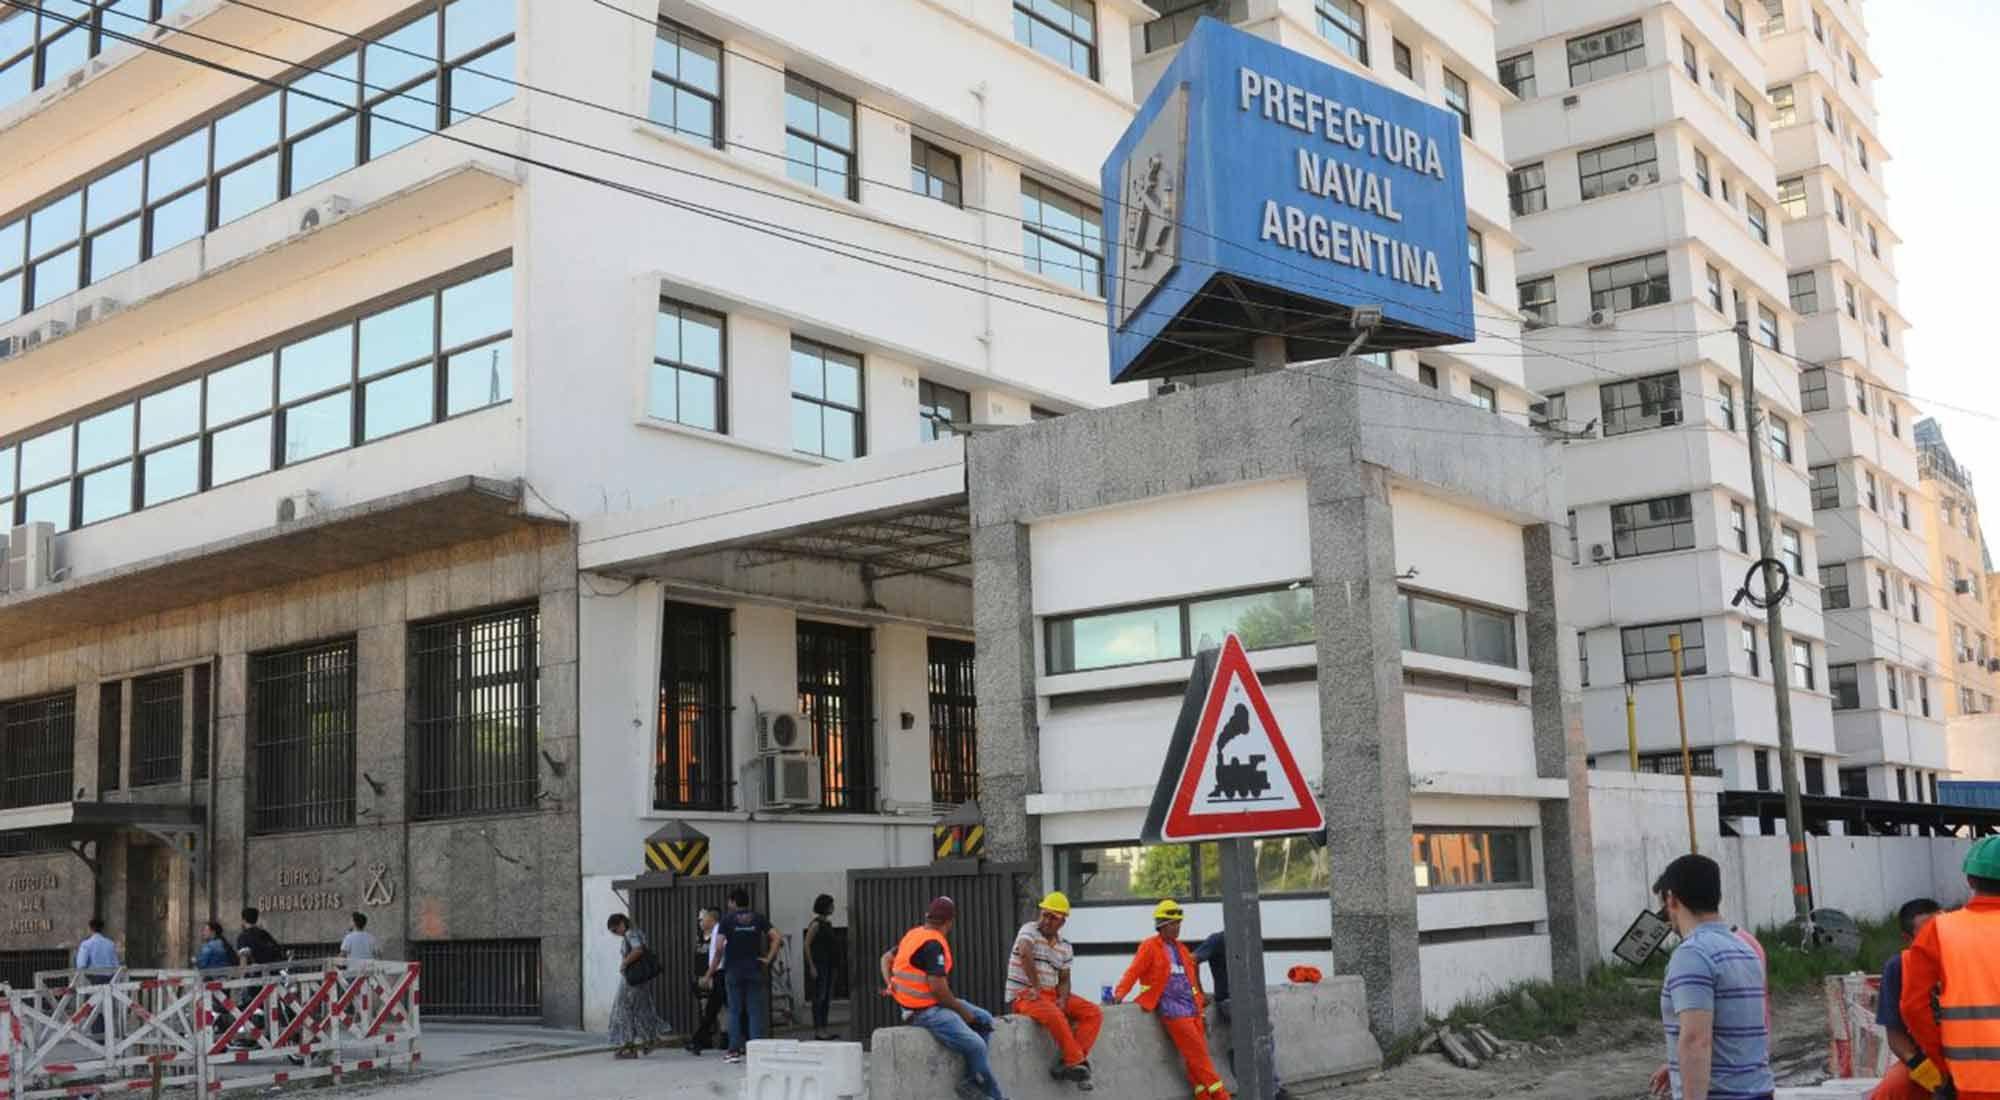 Edificio de Prefectura Naval Argentina